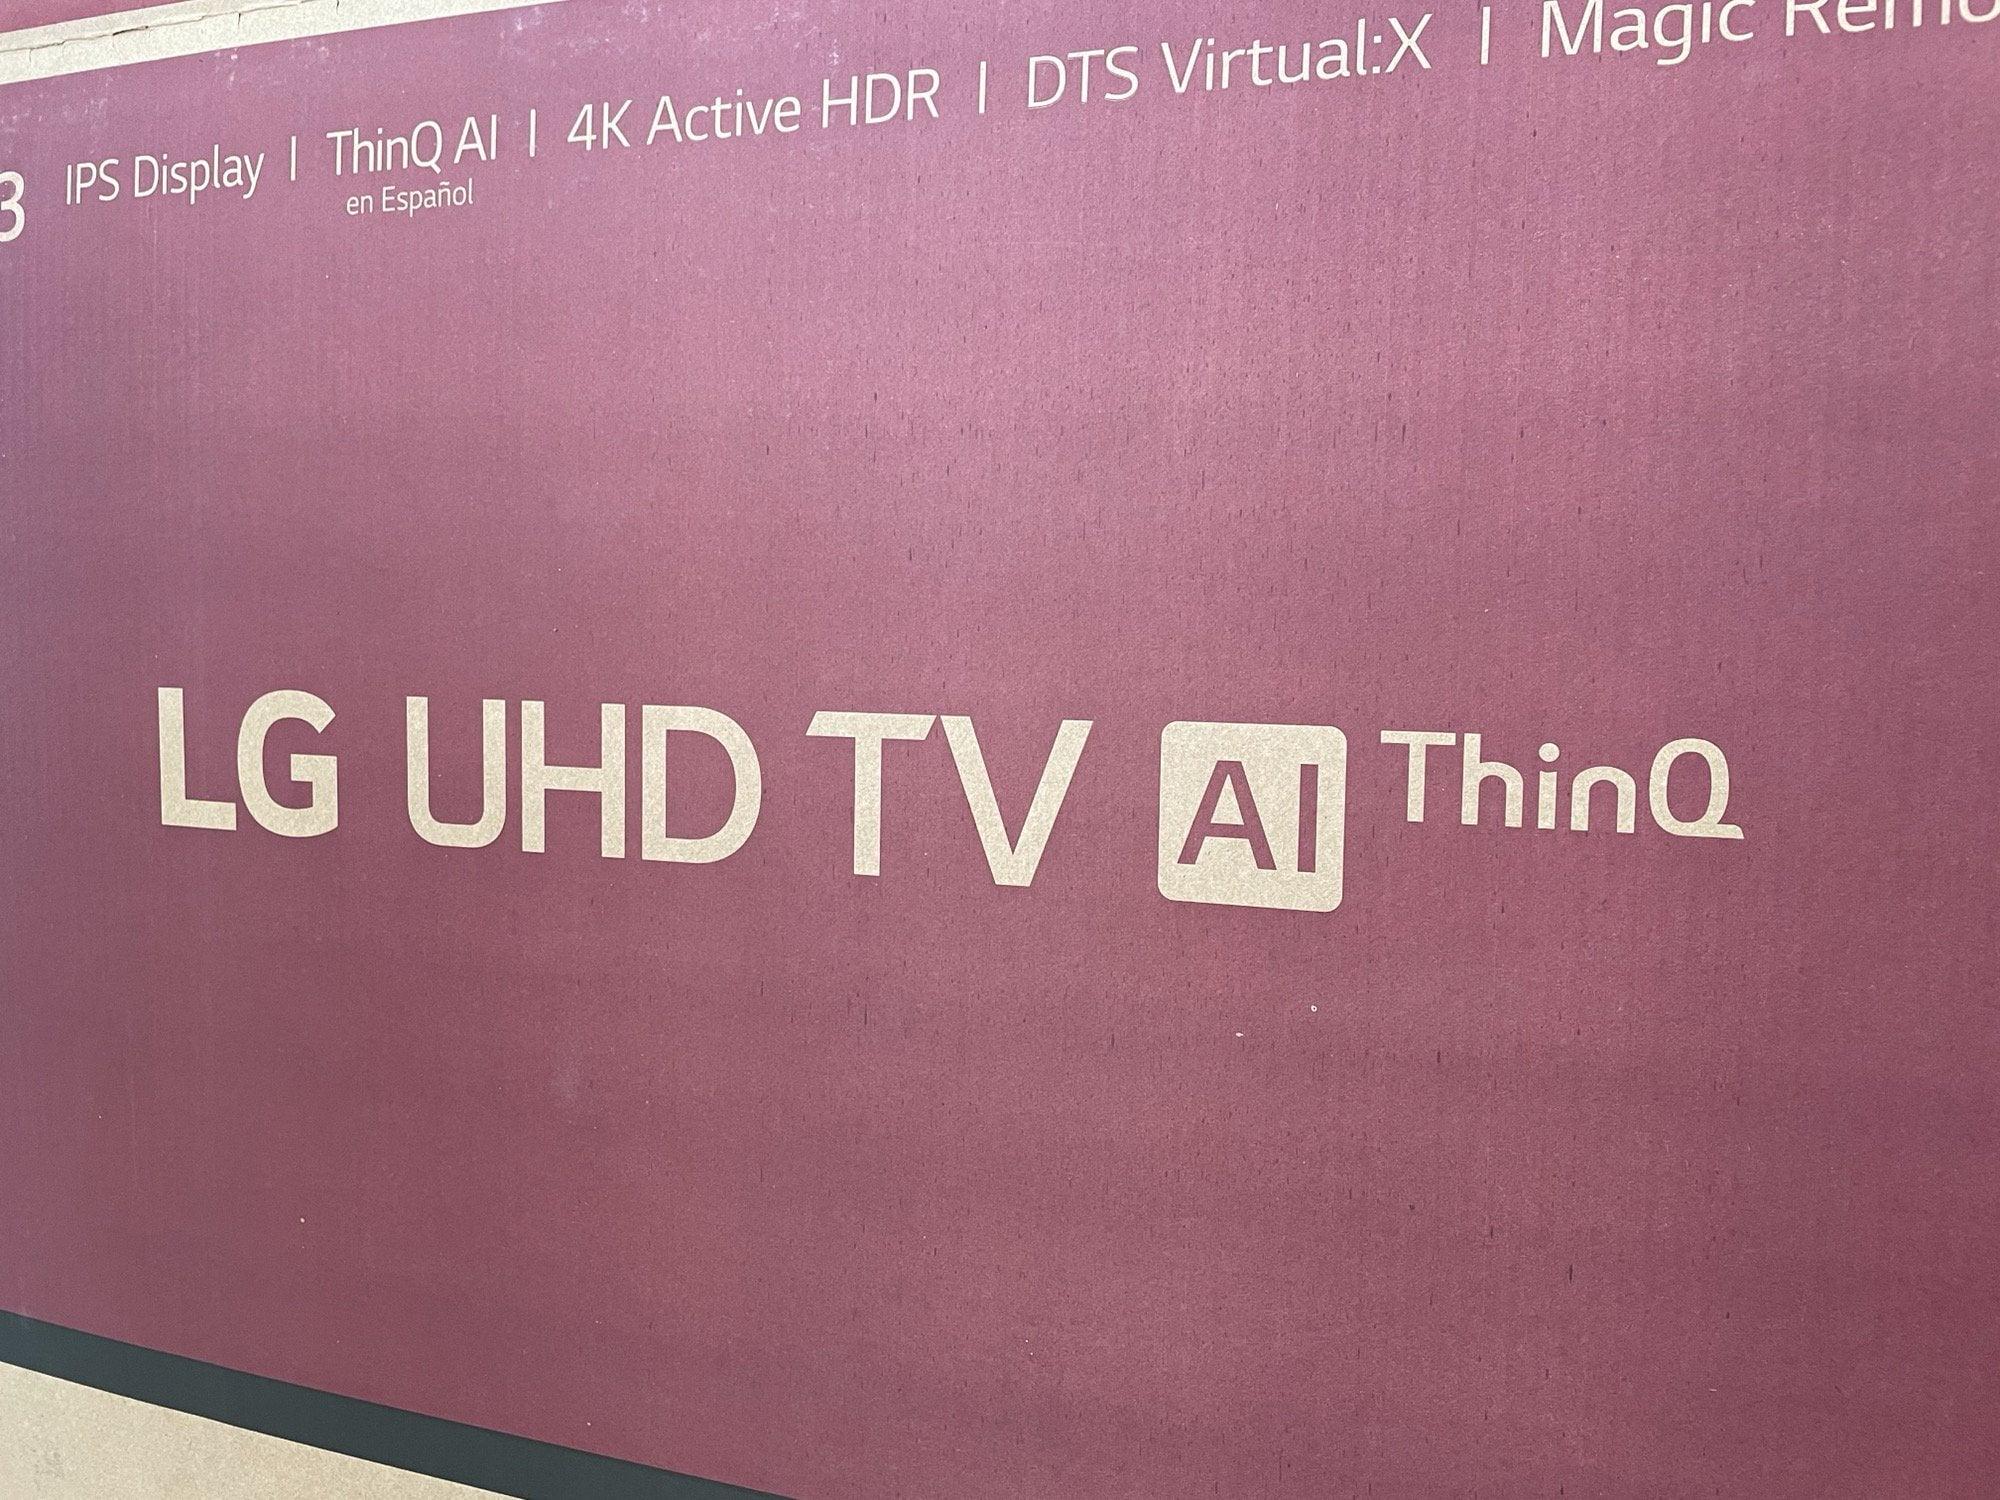 The Fun HomeKit weekend awaits LG UHD TV Air sensor